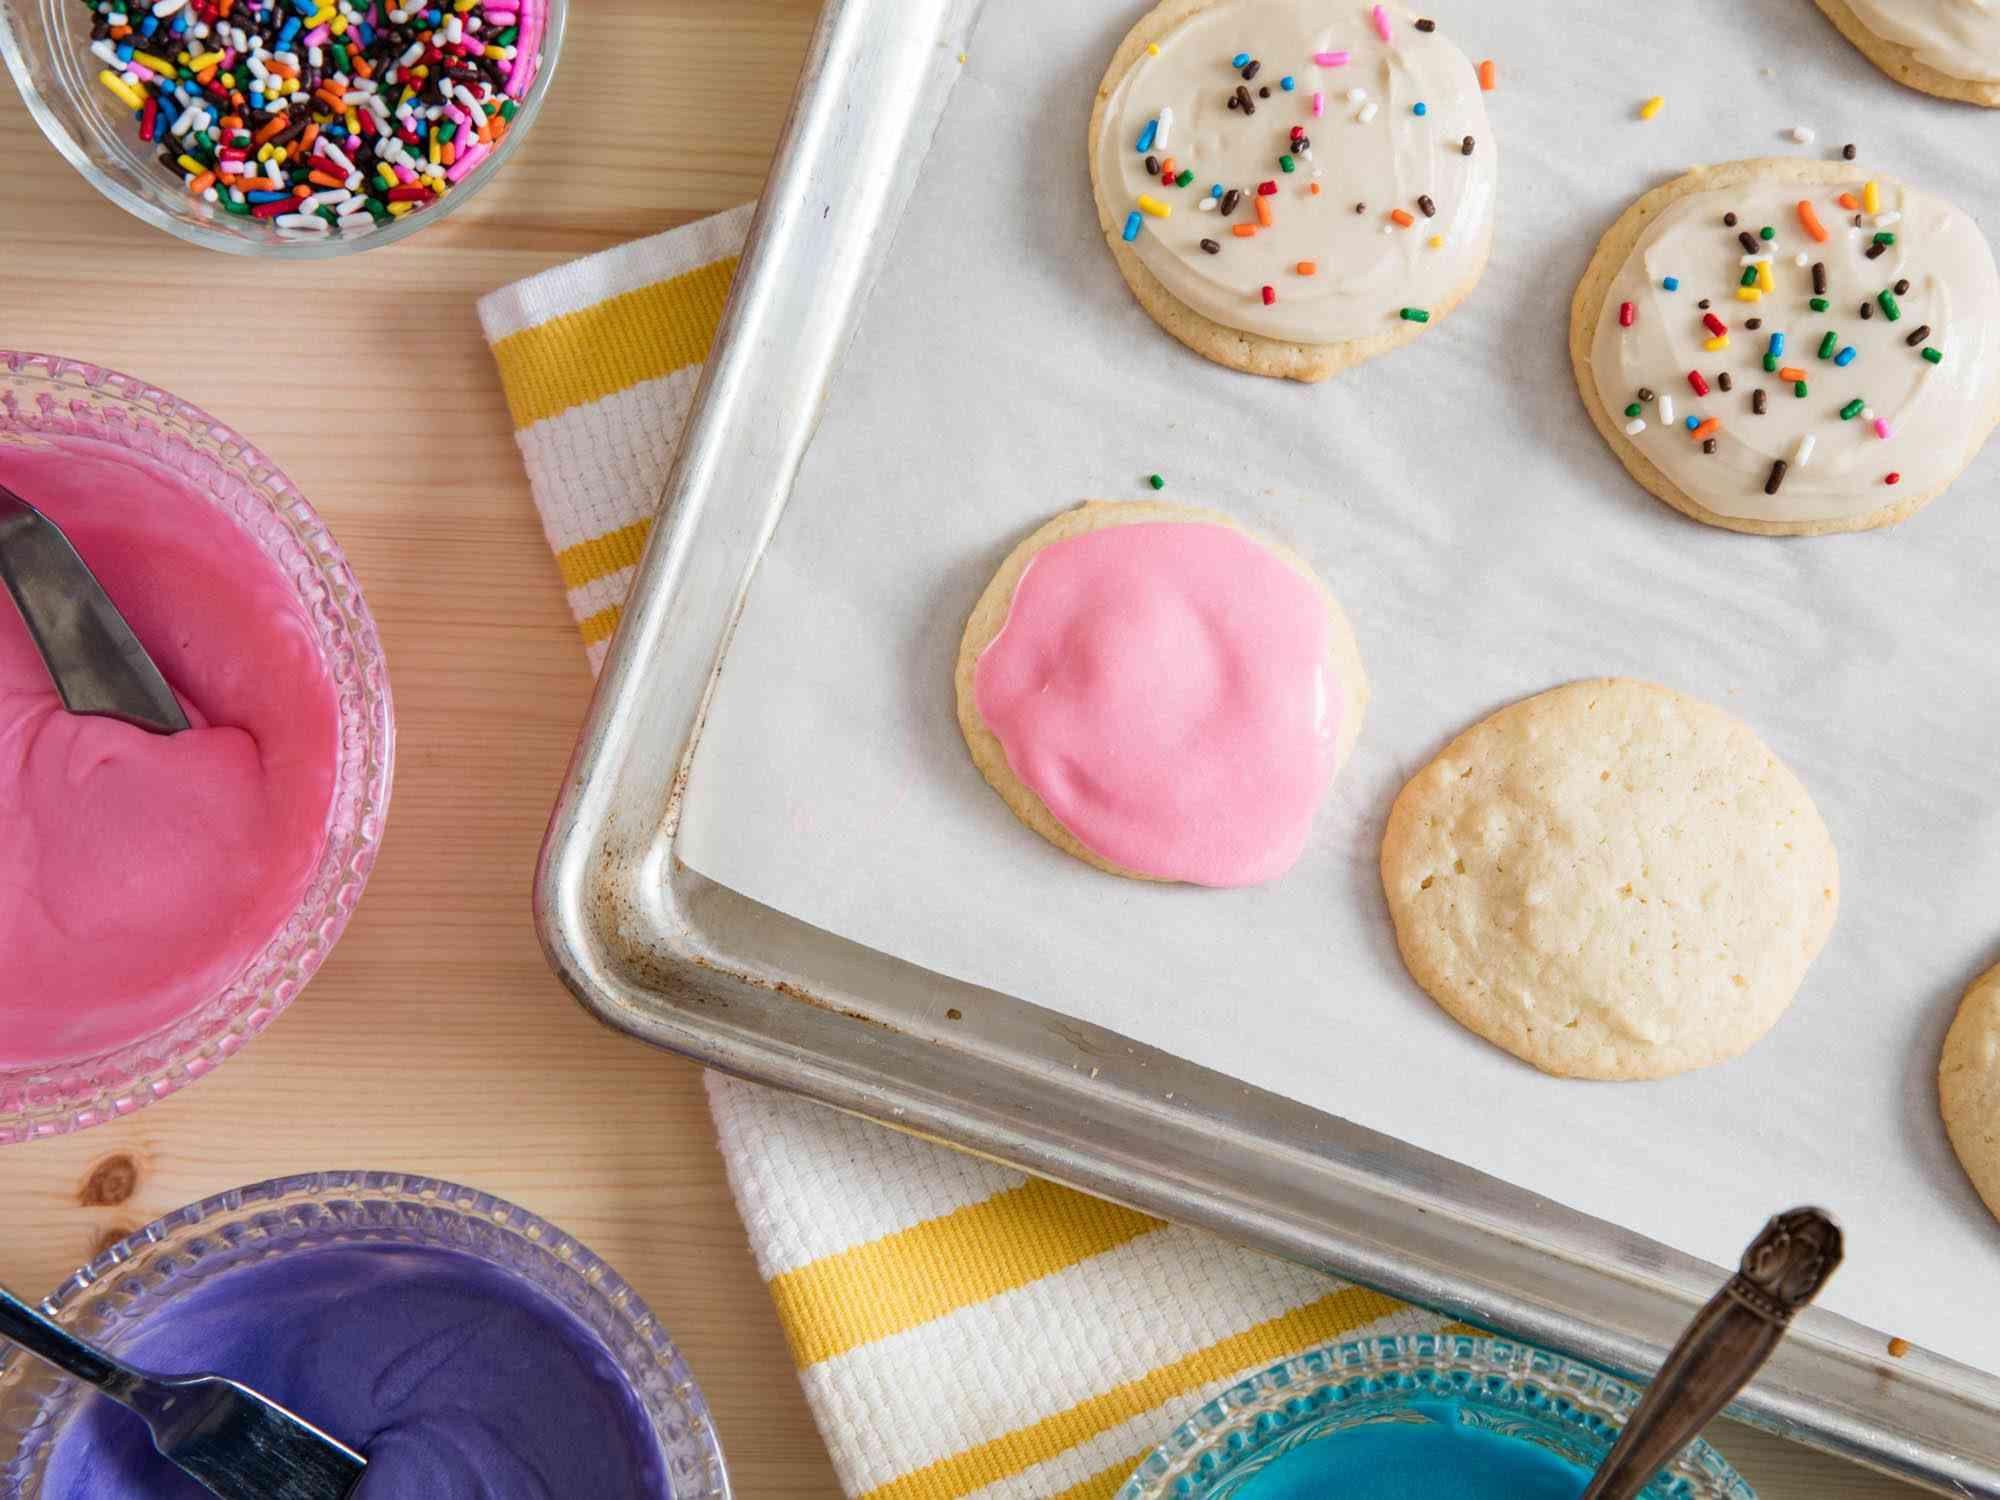 20160610-lofthouse-cookies-vicky-wasik-1.jpg